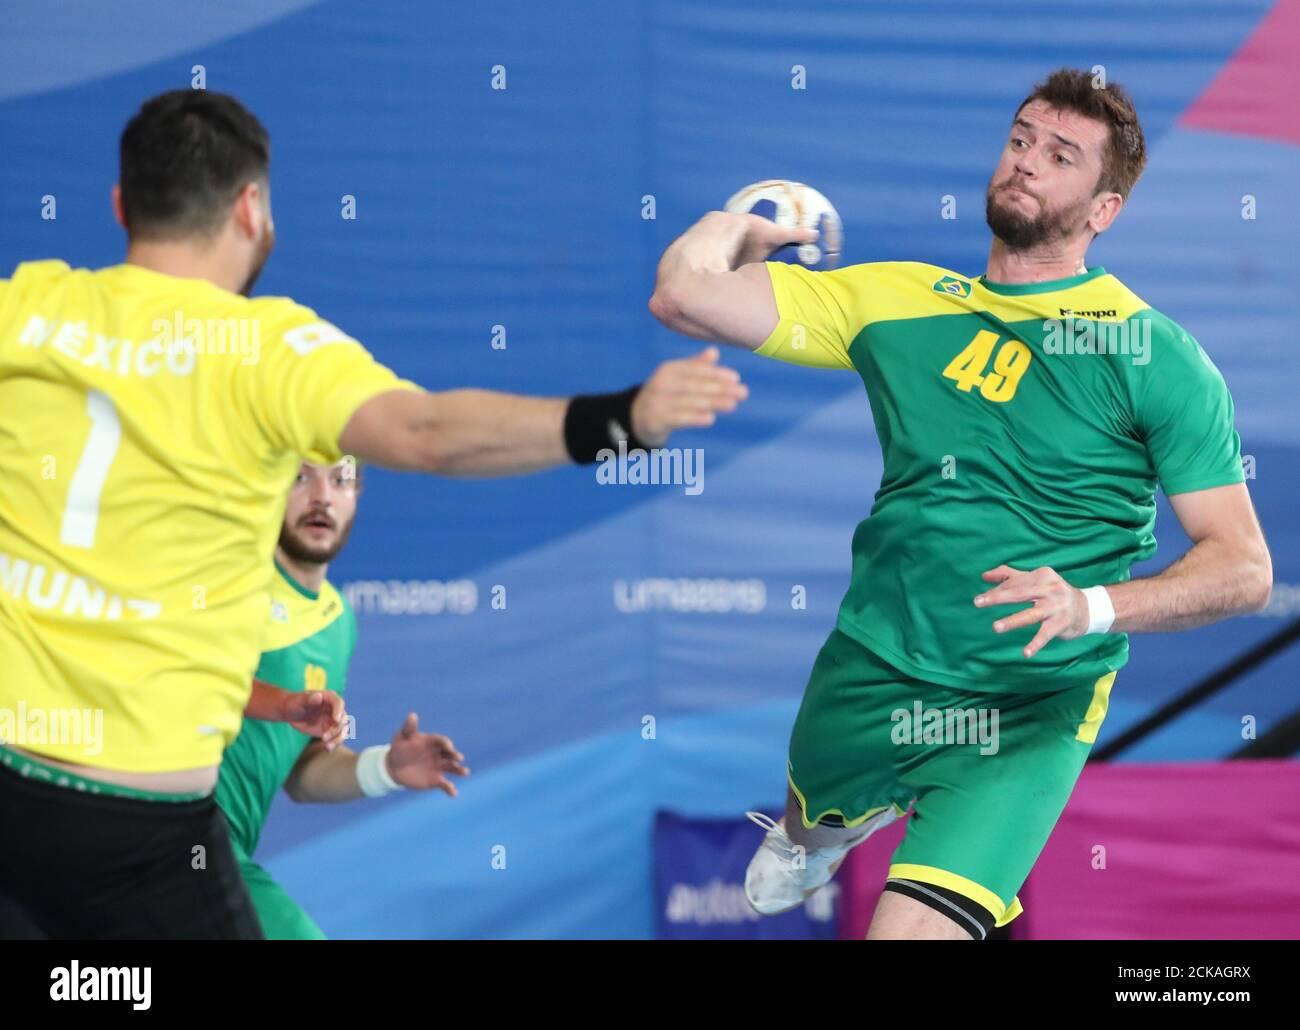 XVIII Pan American Games - Lima 2019  - Handball - Men Bronze Medal Match - Brazil Vs. Mexico - Sports Center 1, Lima, Peru - August 5, 2019. Brazil's Raul Nantes in action with Mexico's Francisco Muniz. REUTERS/Sergio Moraes Stock Photo